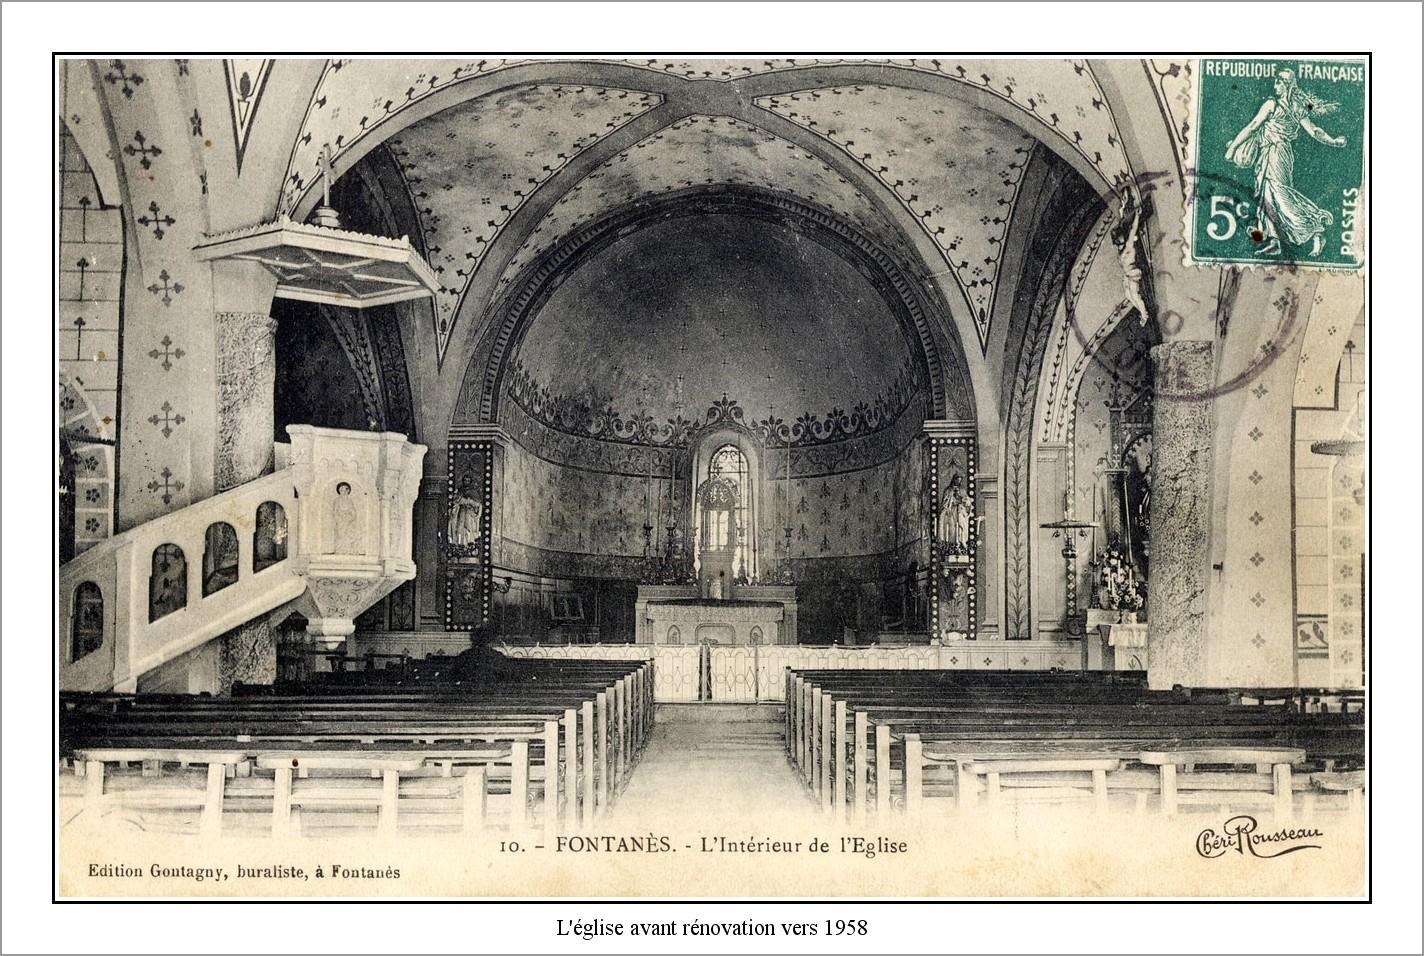 Eglise 1900-nano-BorderMaker.jpg